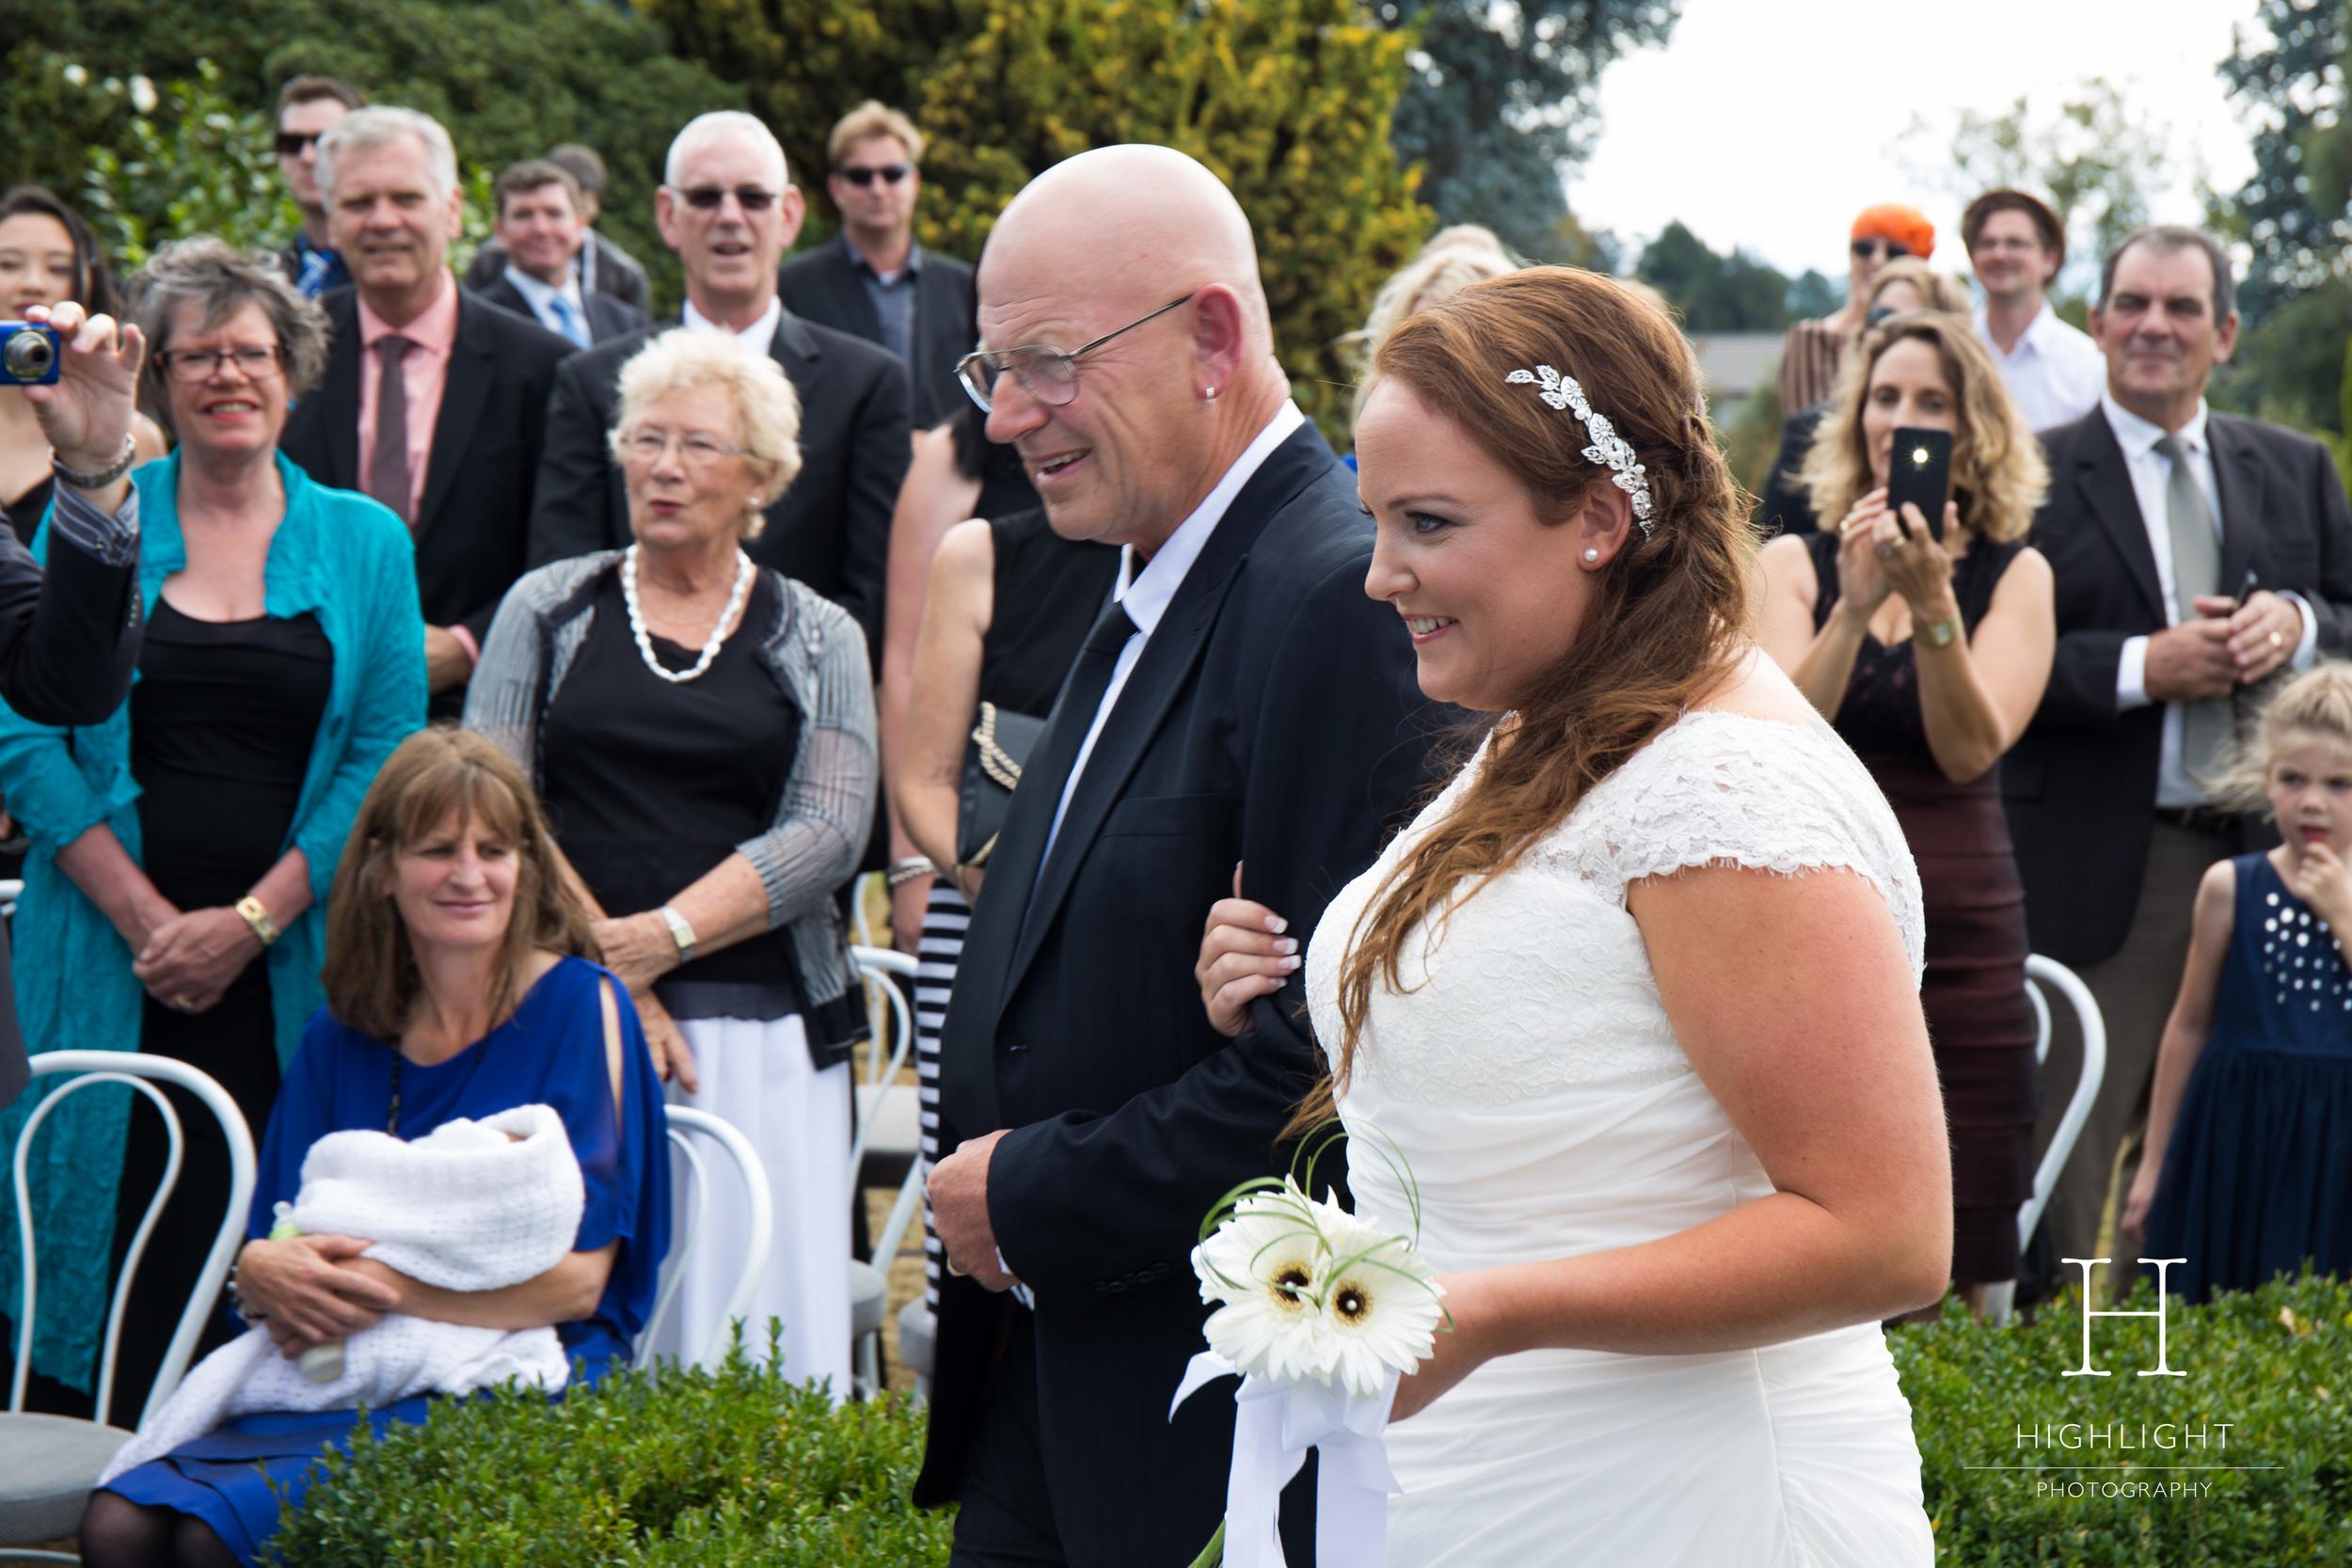 highlight_photography_wedding_new_zealand_ceremony_bride.jpg